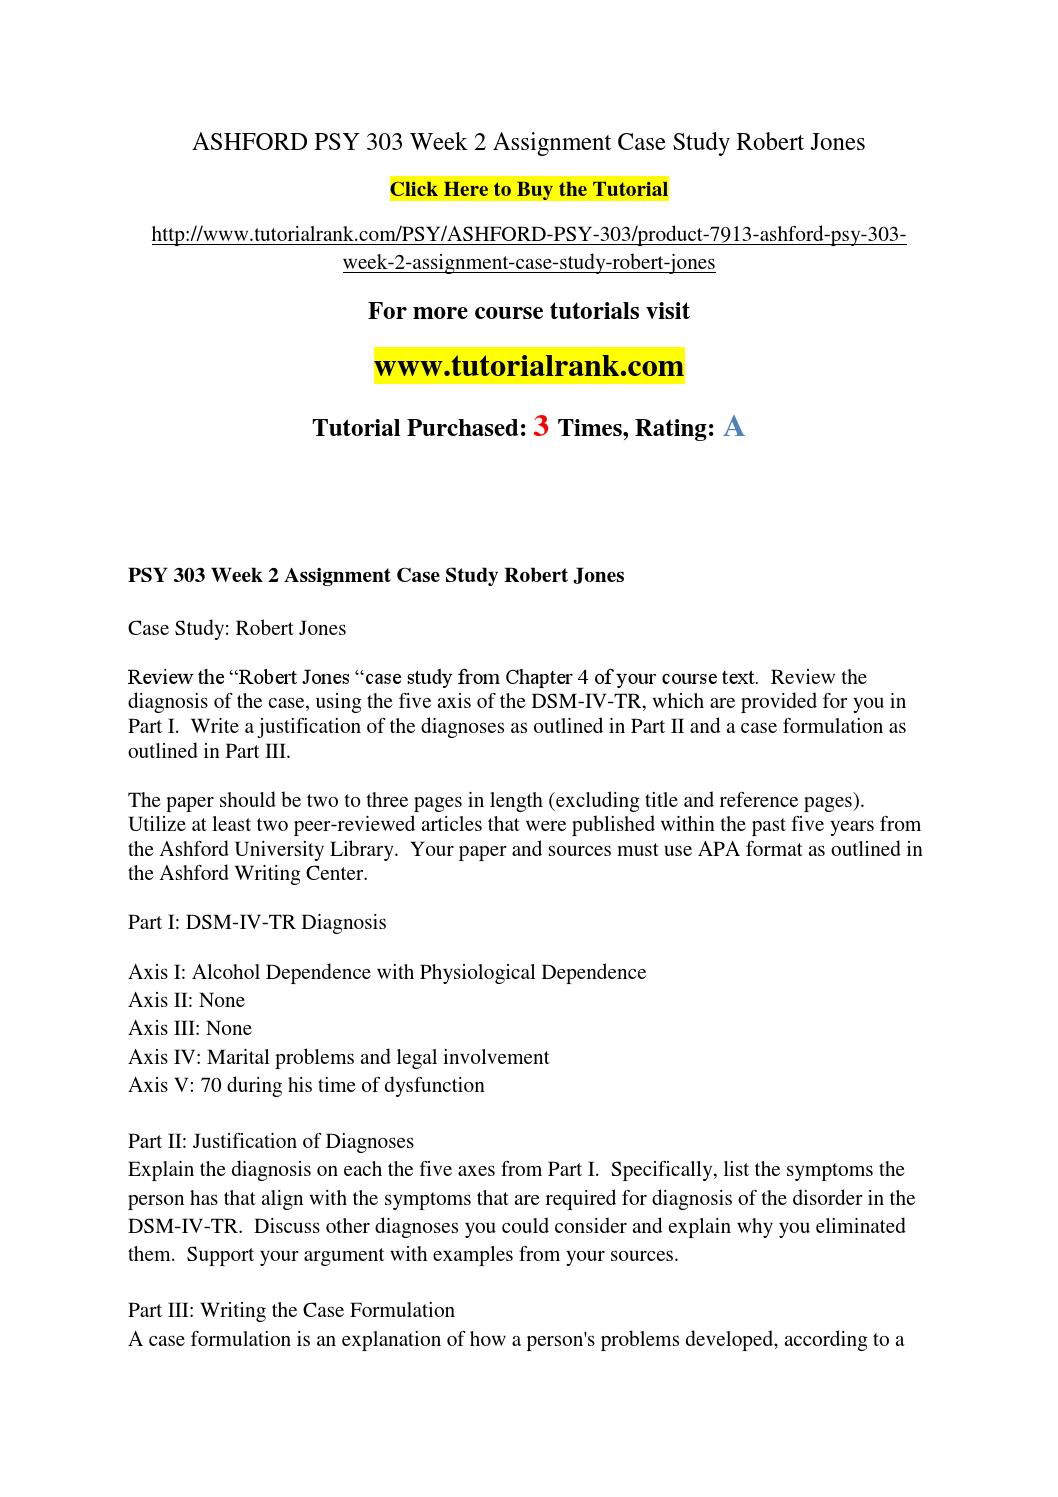 Rjr nabisco case study solutions